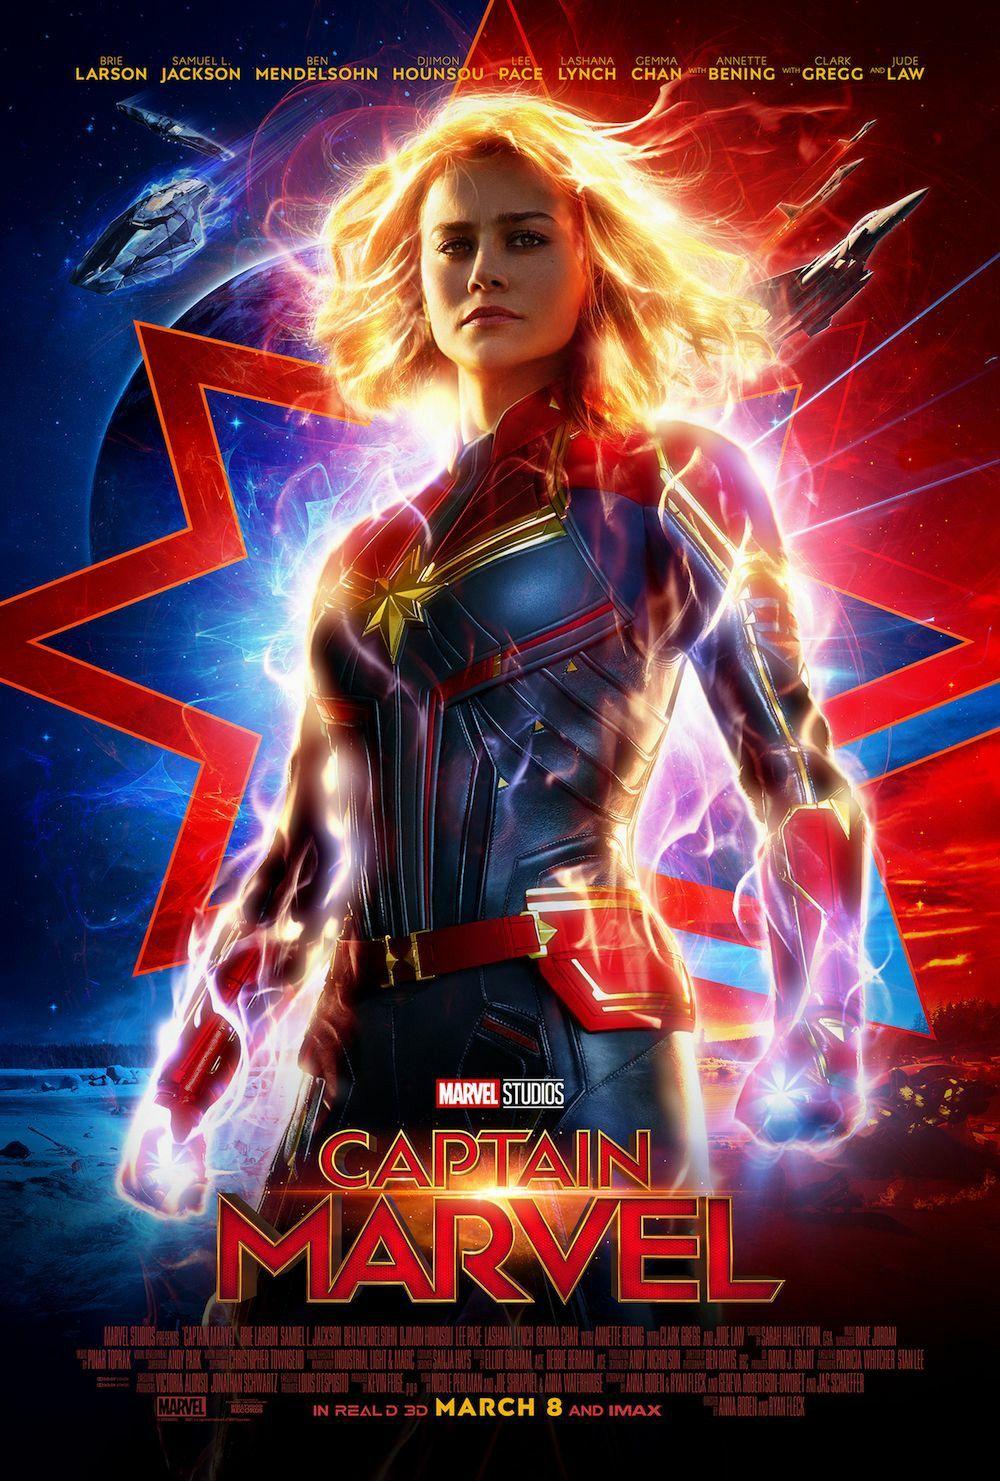 Avenger 4 End game Captain marvel, Marvel, Siêu anh hùng